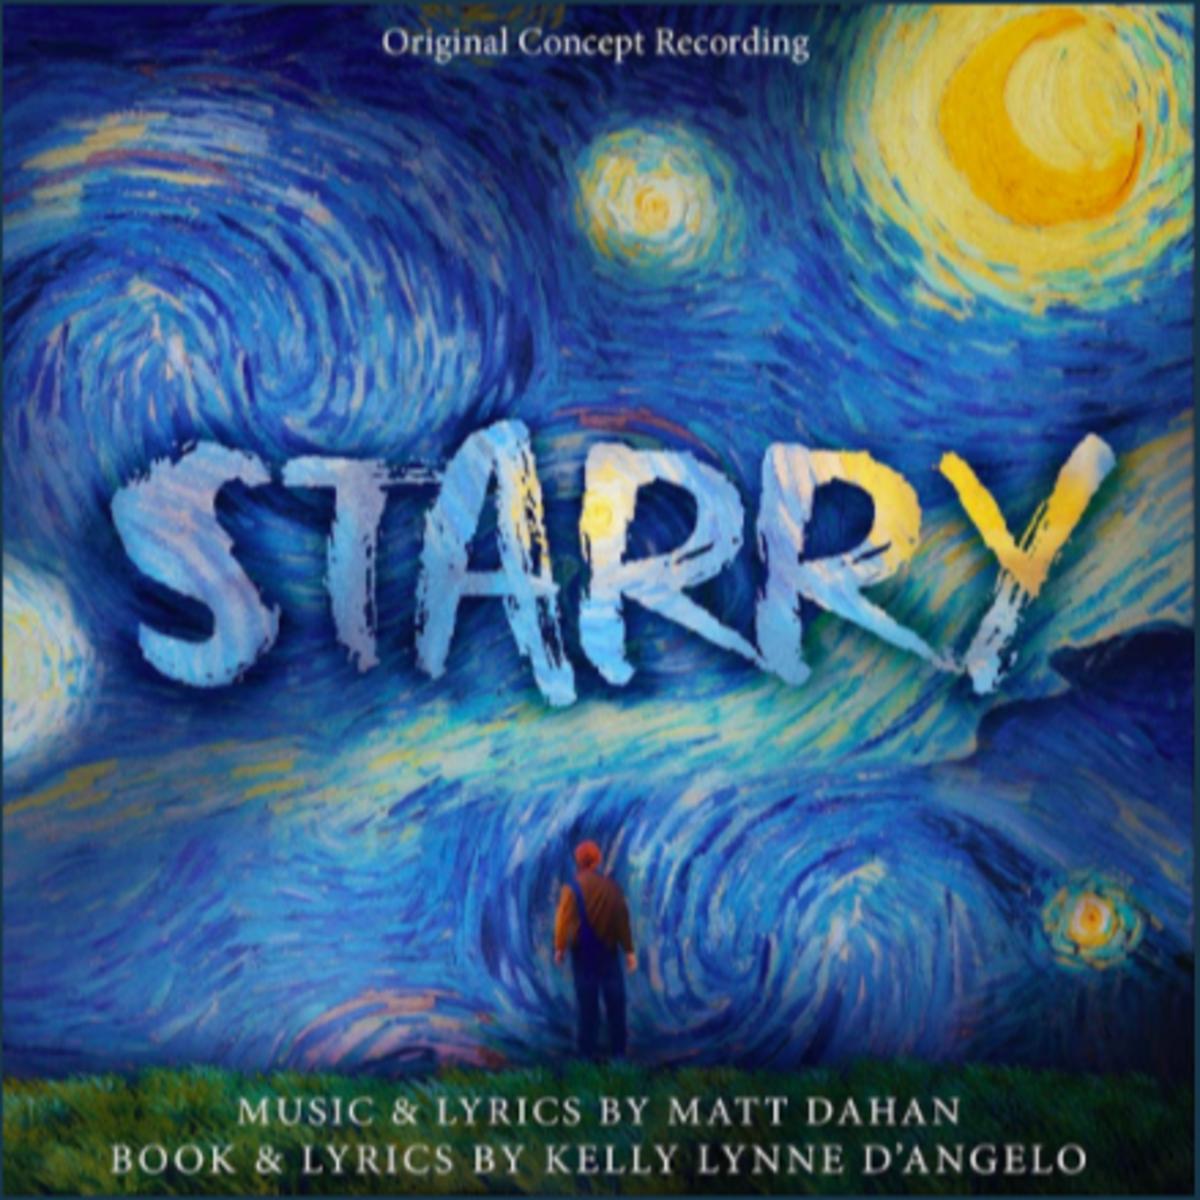 """Starry"" Album Cover"